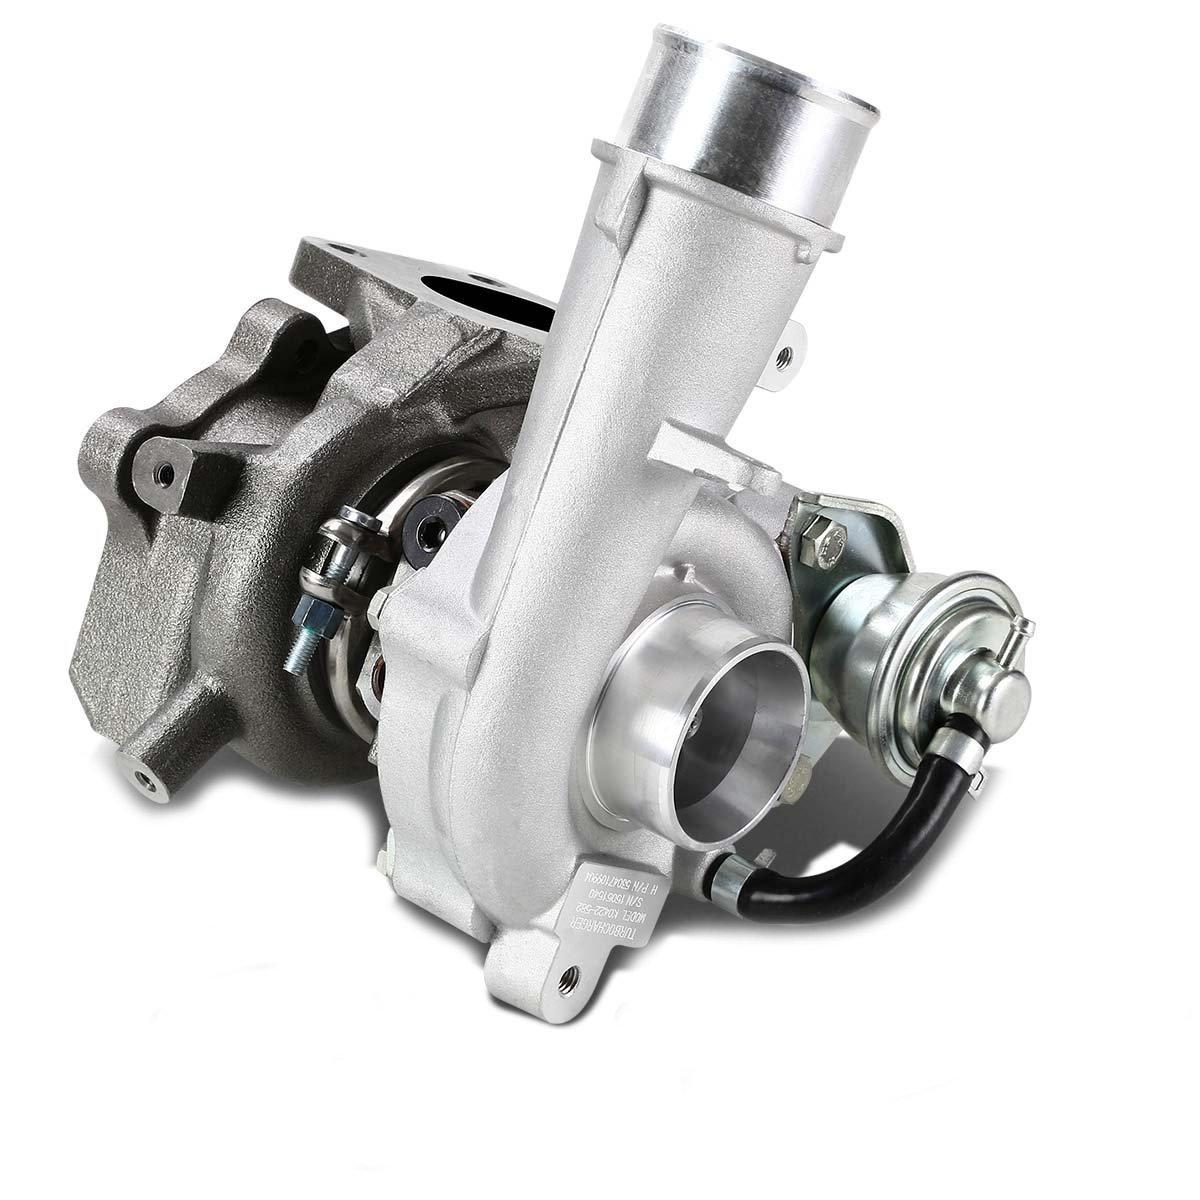 HJL Turbo - Turbocompresor para Mazda 3, 6, 2,3 L, MPS, MZR, DISI 53047109901, K0422-882: Amazon.es: Coche y moto